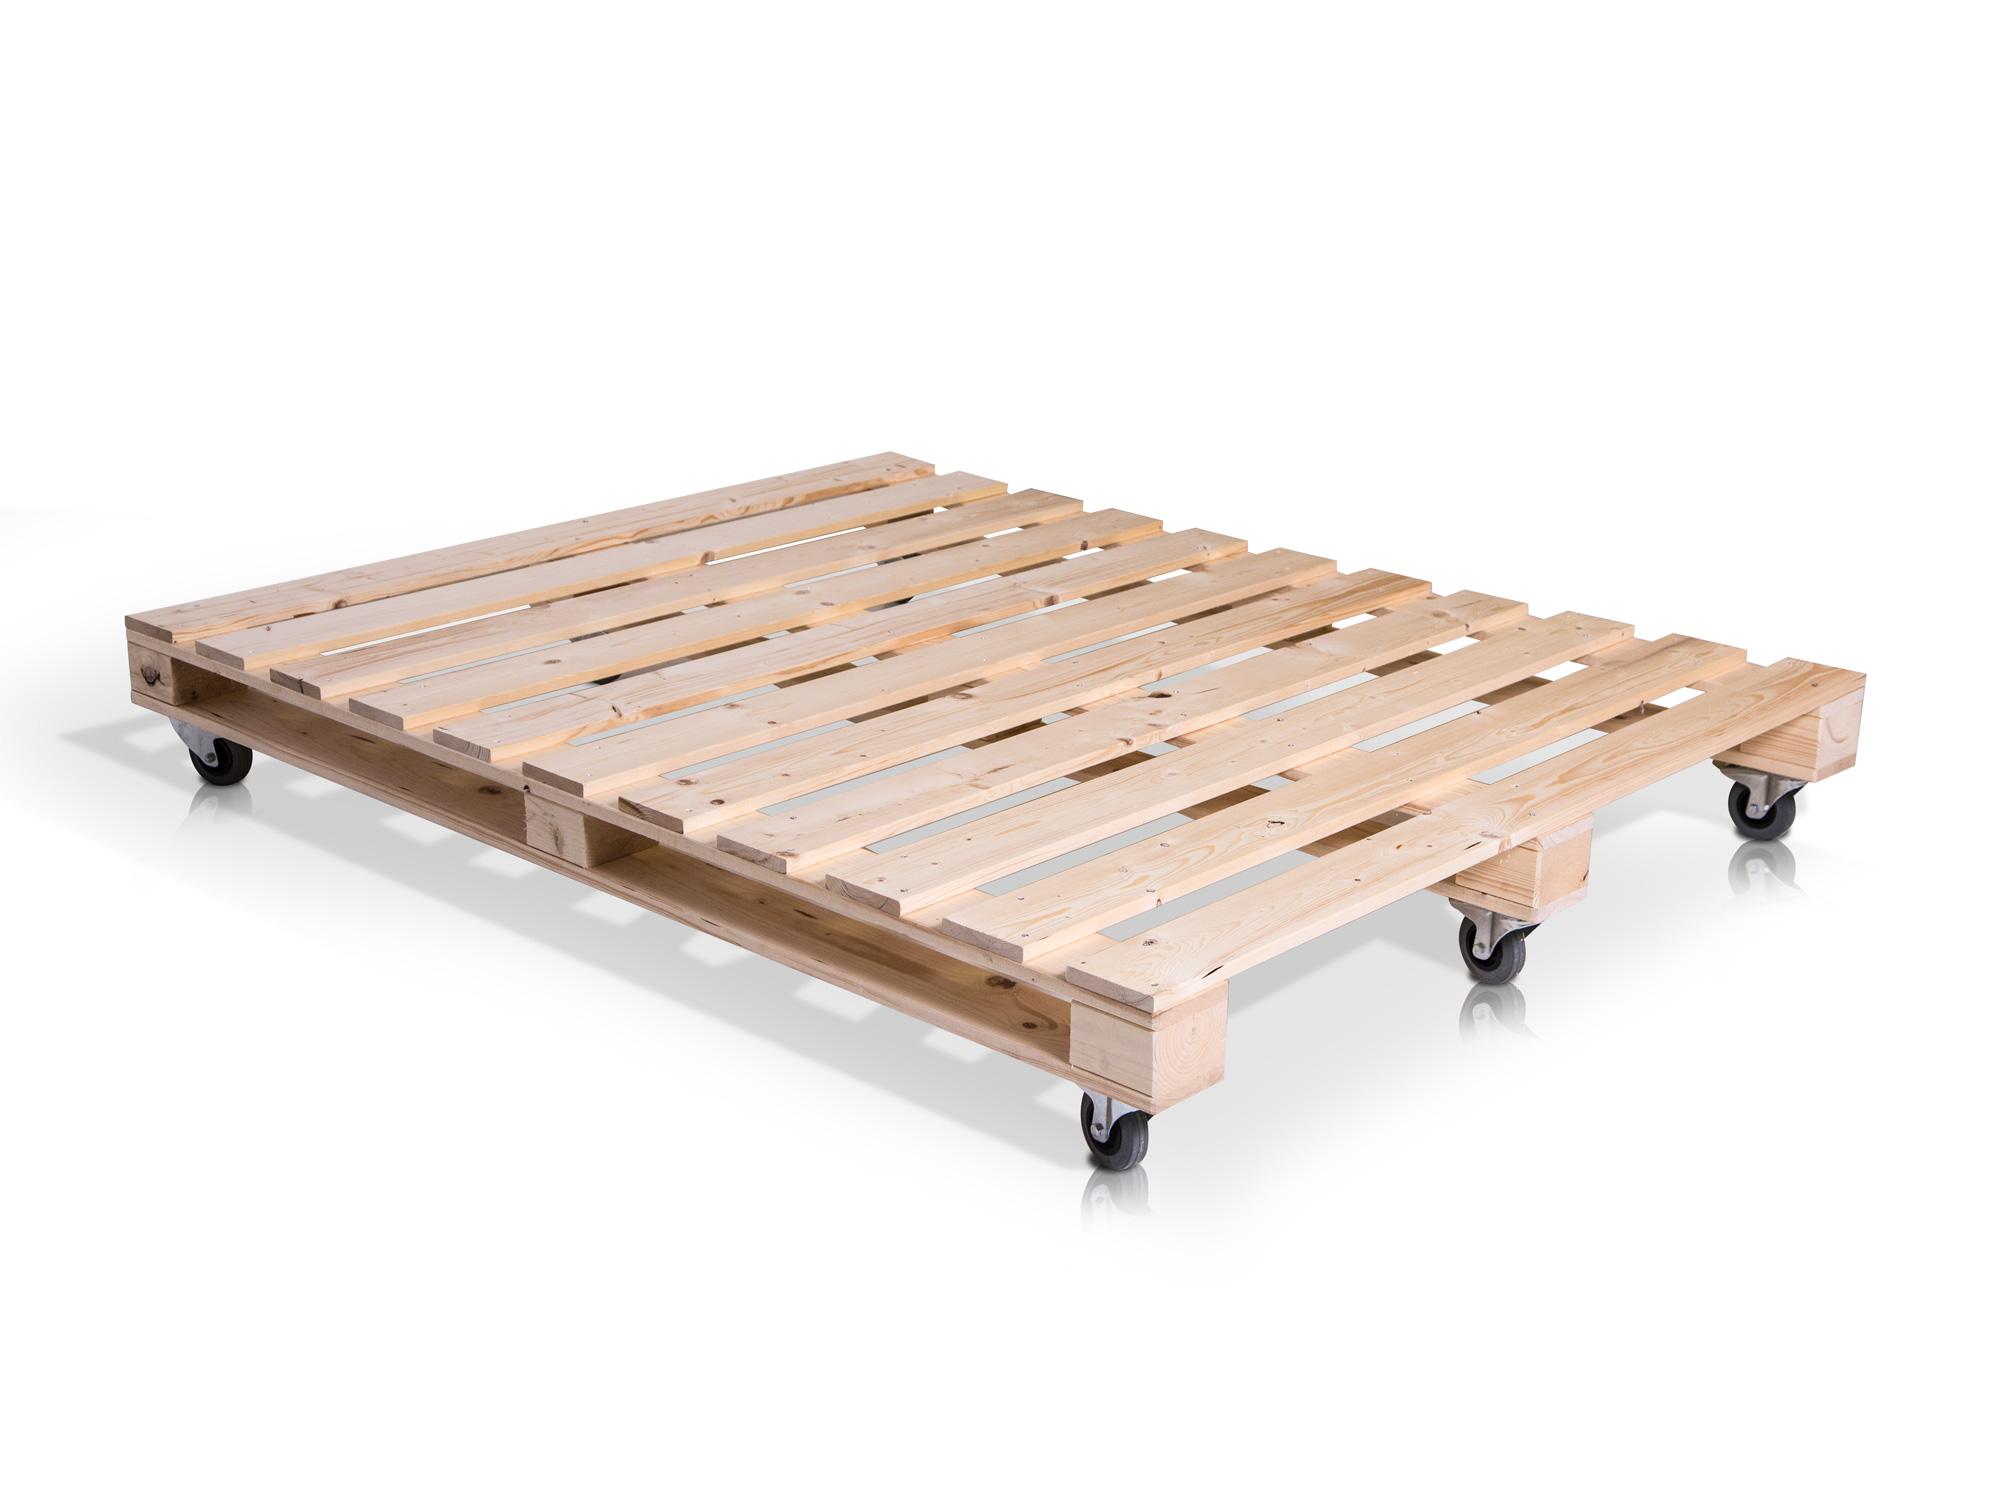 paletti duo massivholzbett aus paletten 90 x 200 cm fichte natur. Black Bedroom Furniture Sets. Home Design Ideas